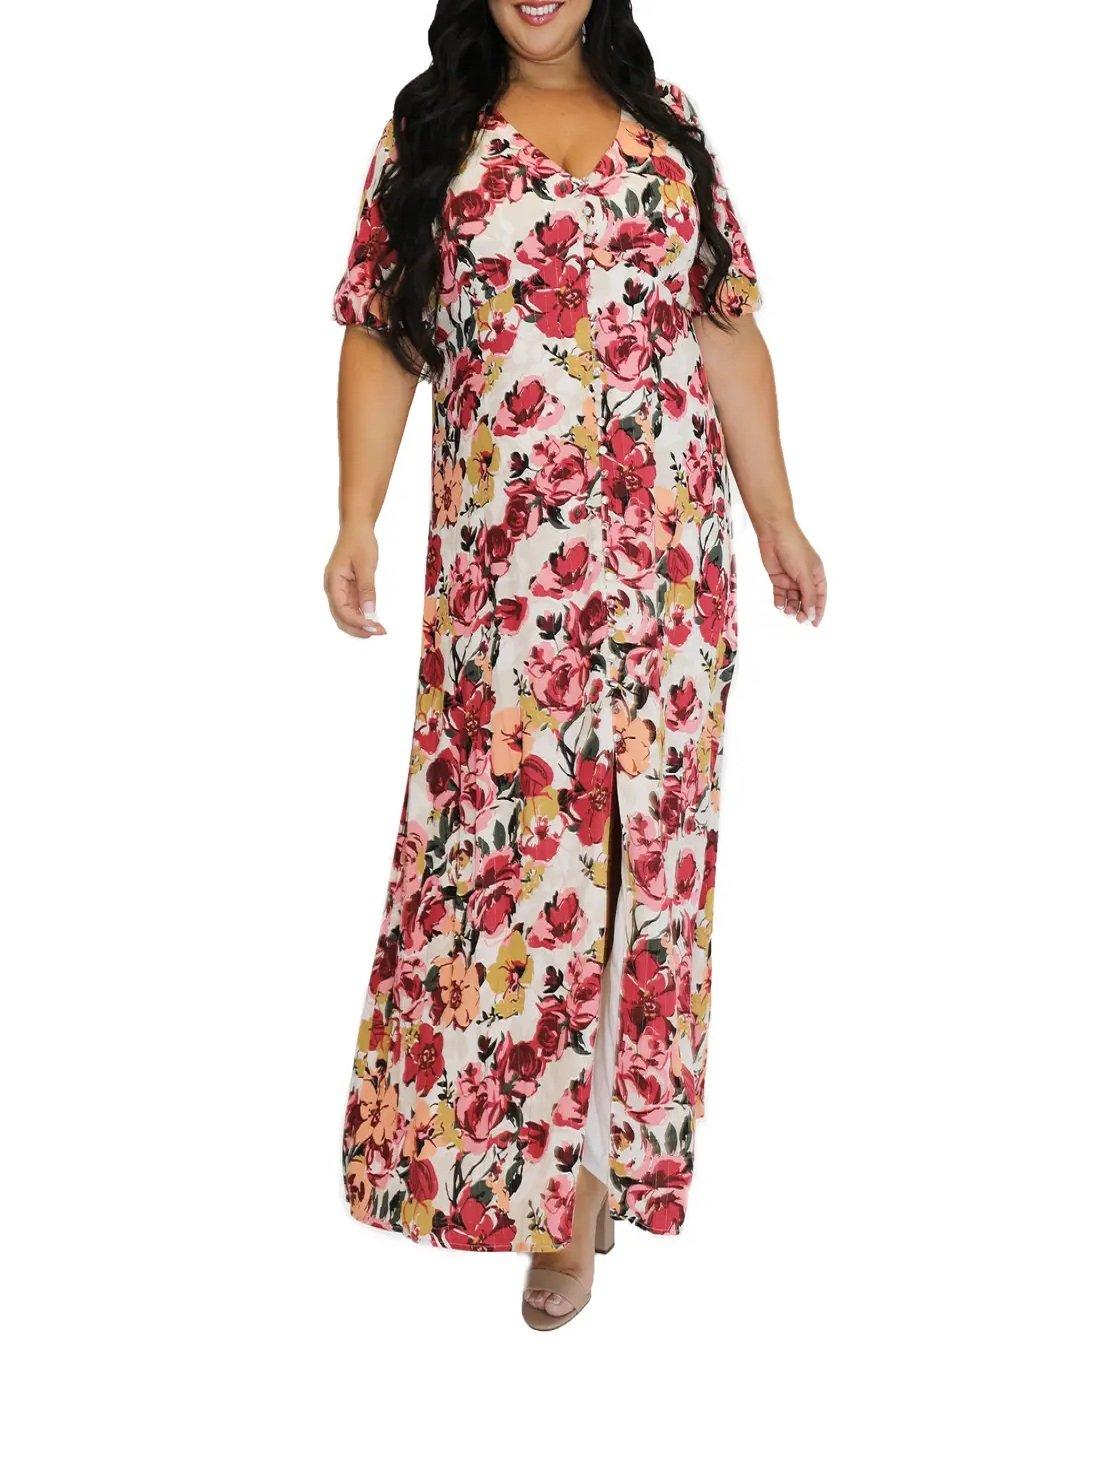 Plus Size Floral Metallic Stripe Peasant Bodice Dress